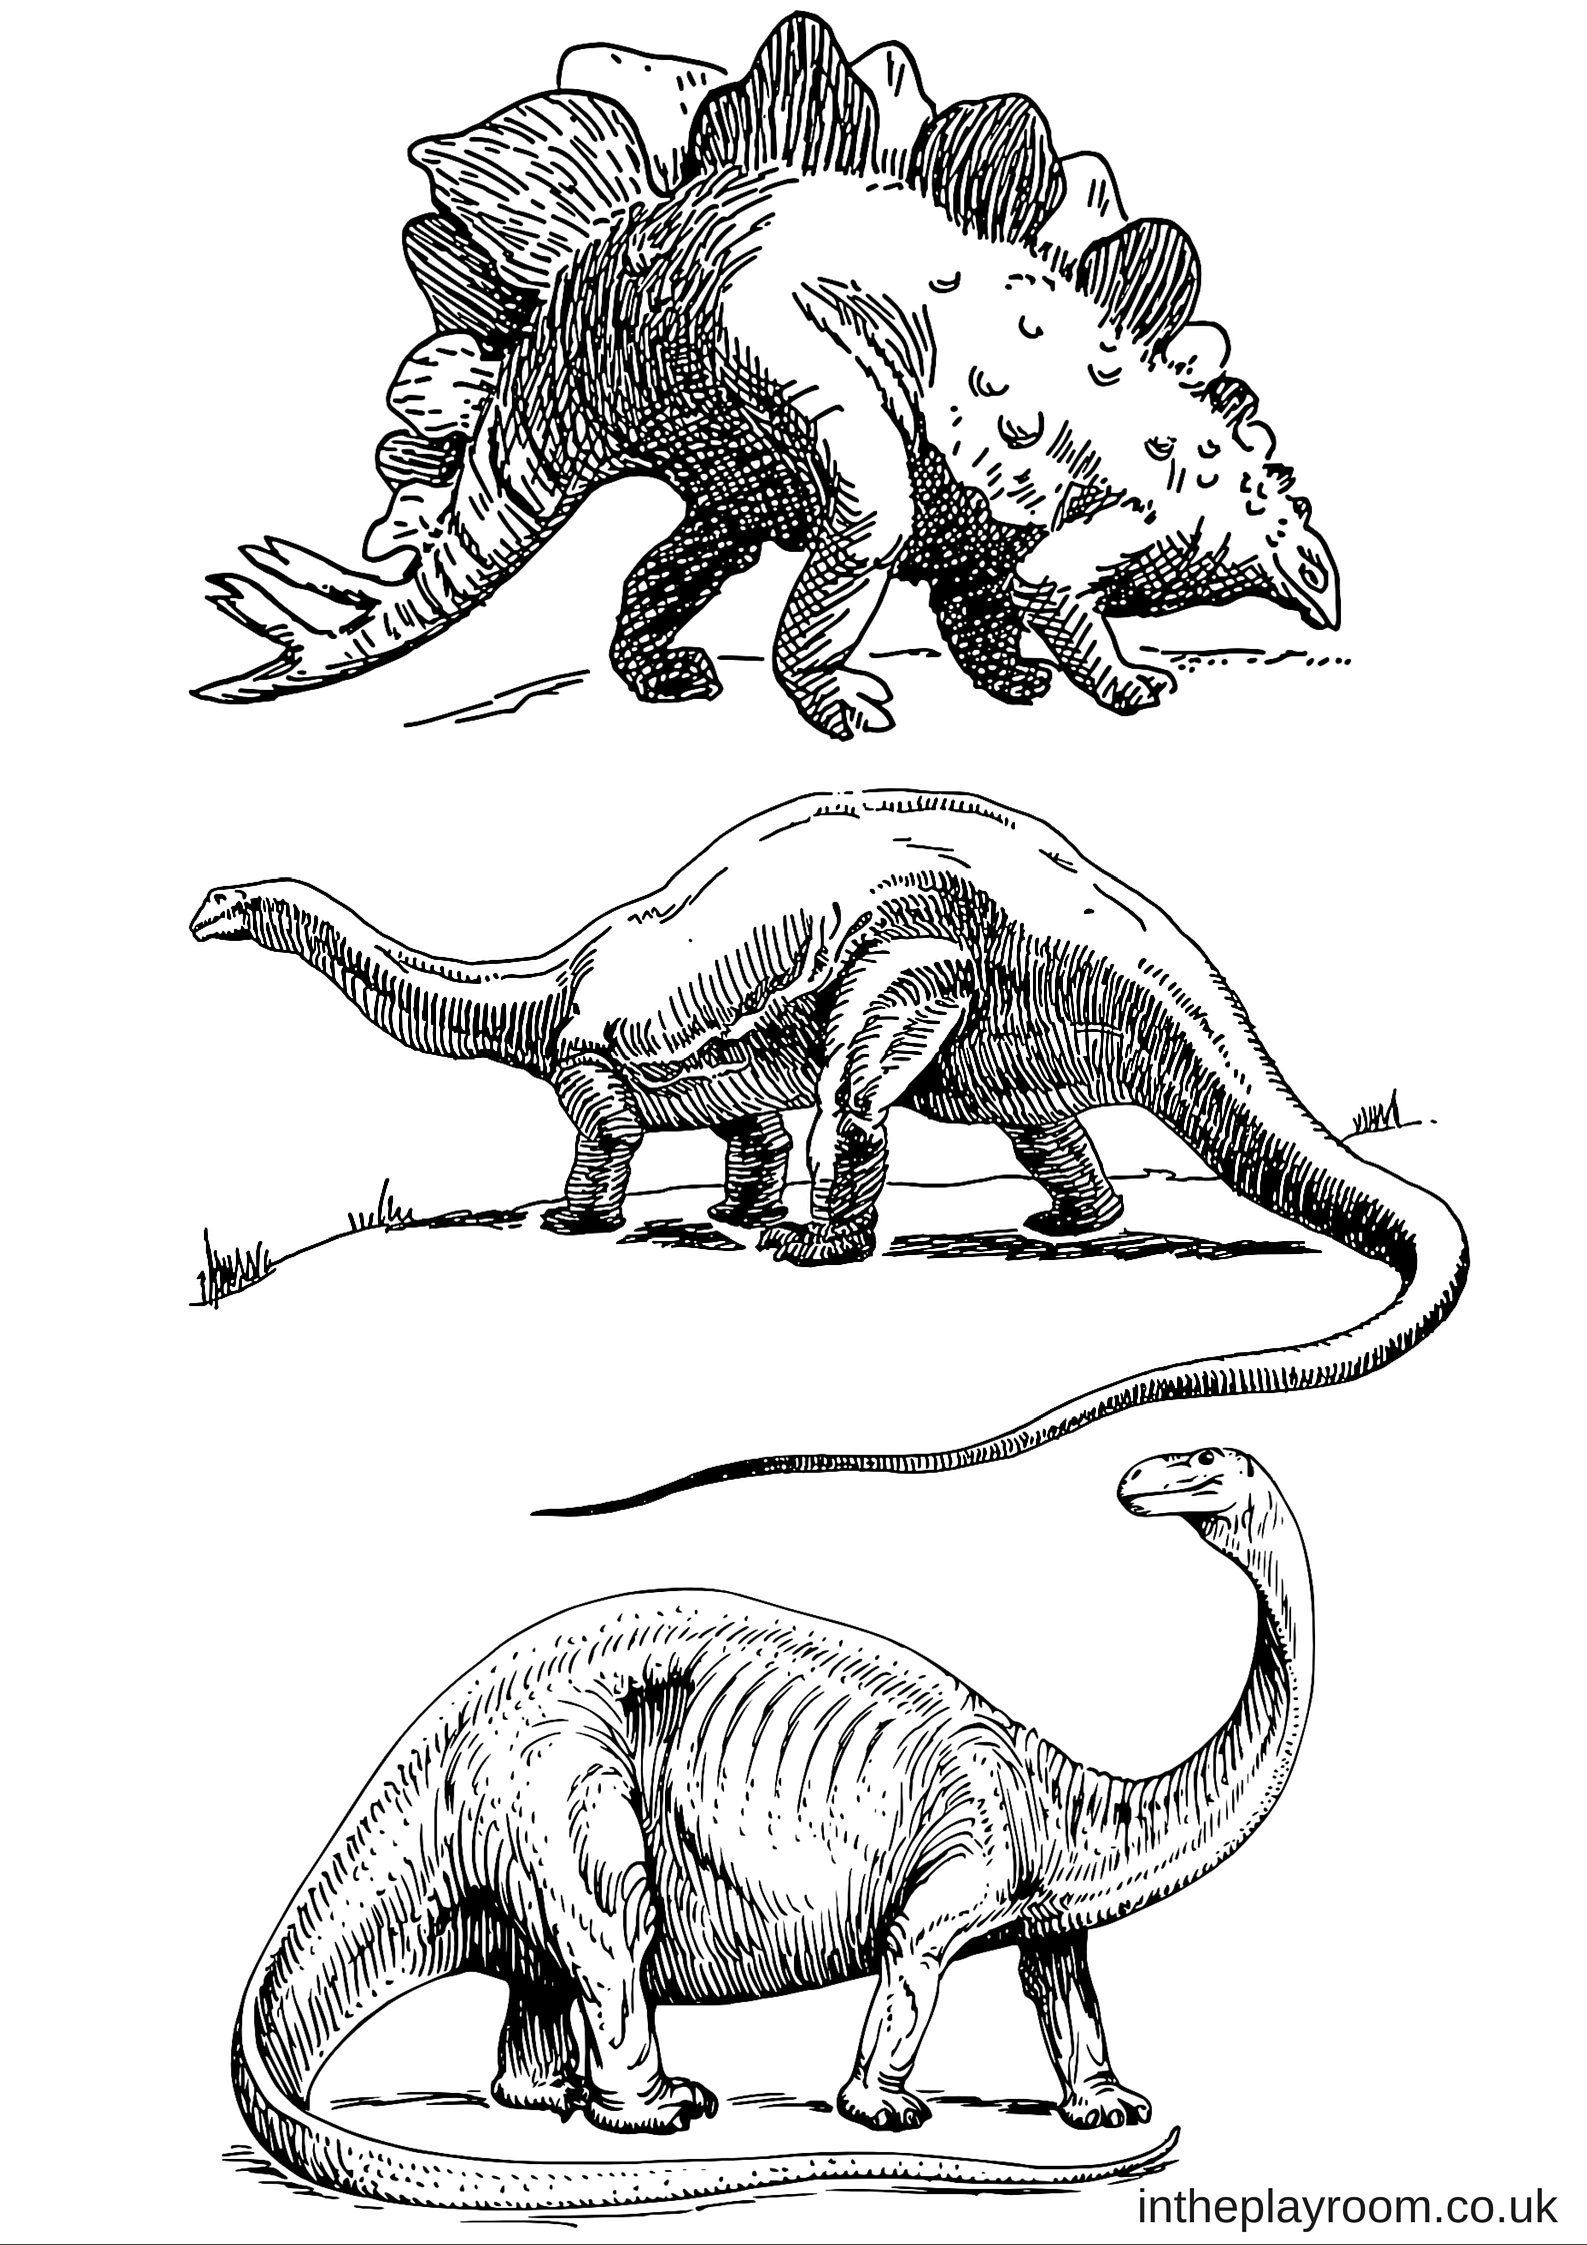 knabstrupper hengst dinosaur coloring pages | Dinosaur Colouring Pages | Dinosaur coloring, Dinosaur ...